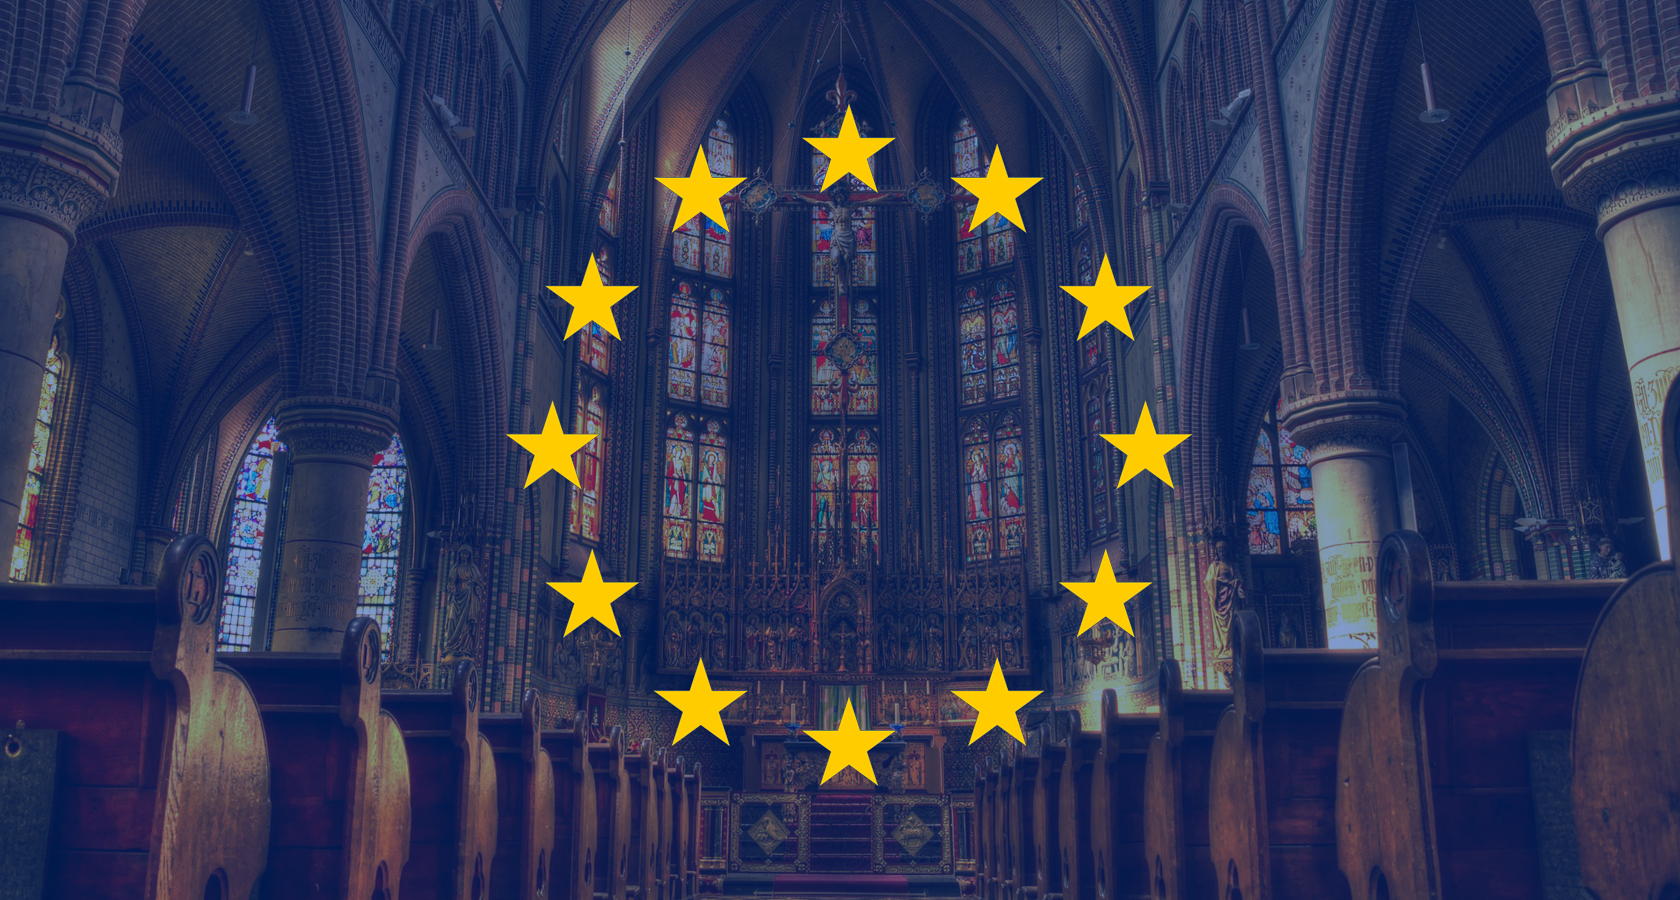 Europa-christelijk-humaan